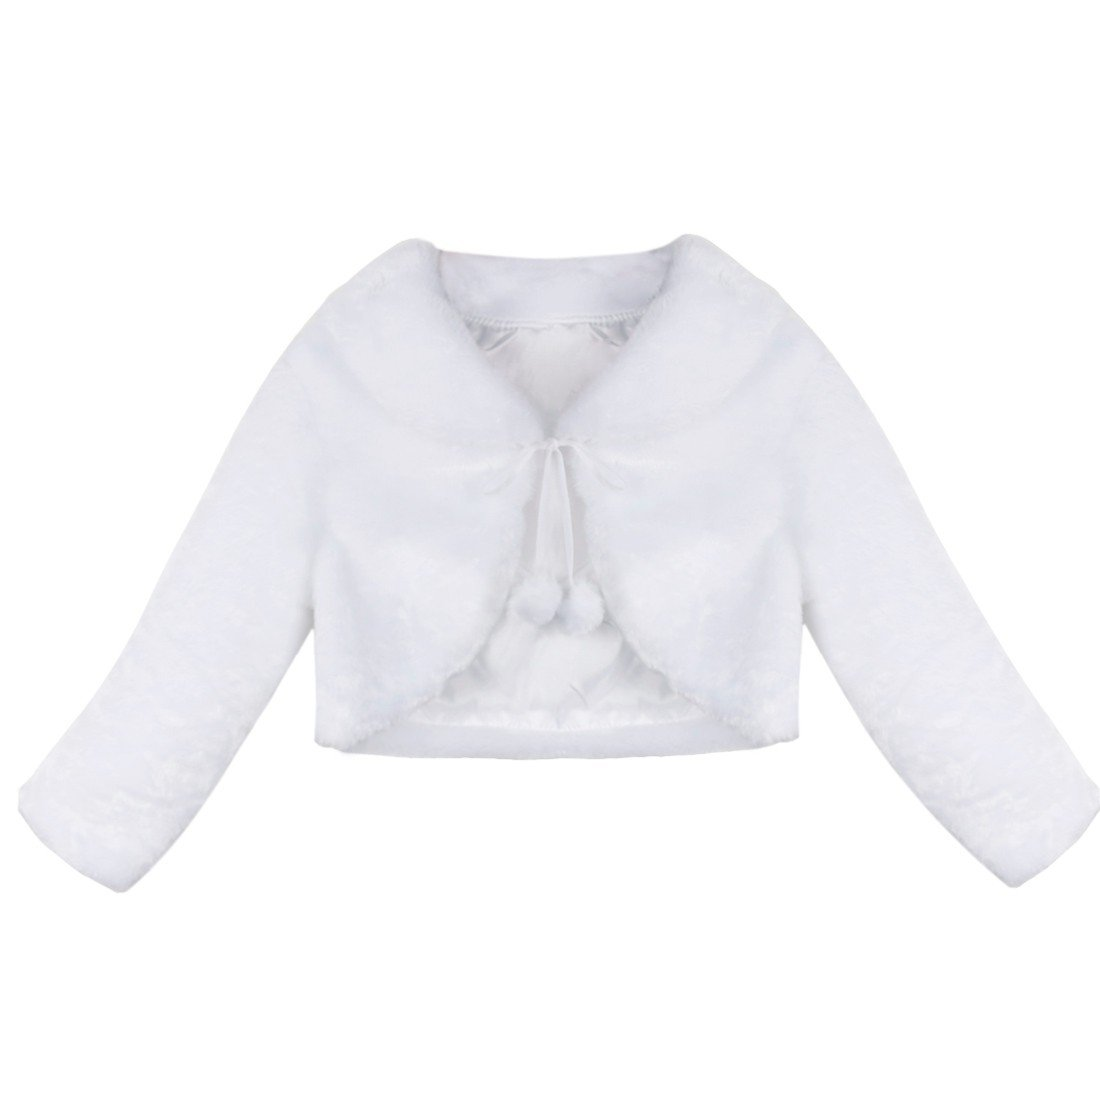 Freebily Girls Faux Fur Long Sleeve Princess Coat Wedding Bridesmaid Birthday Party White Jacket White 7-8